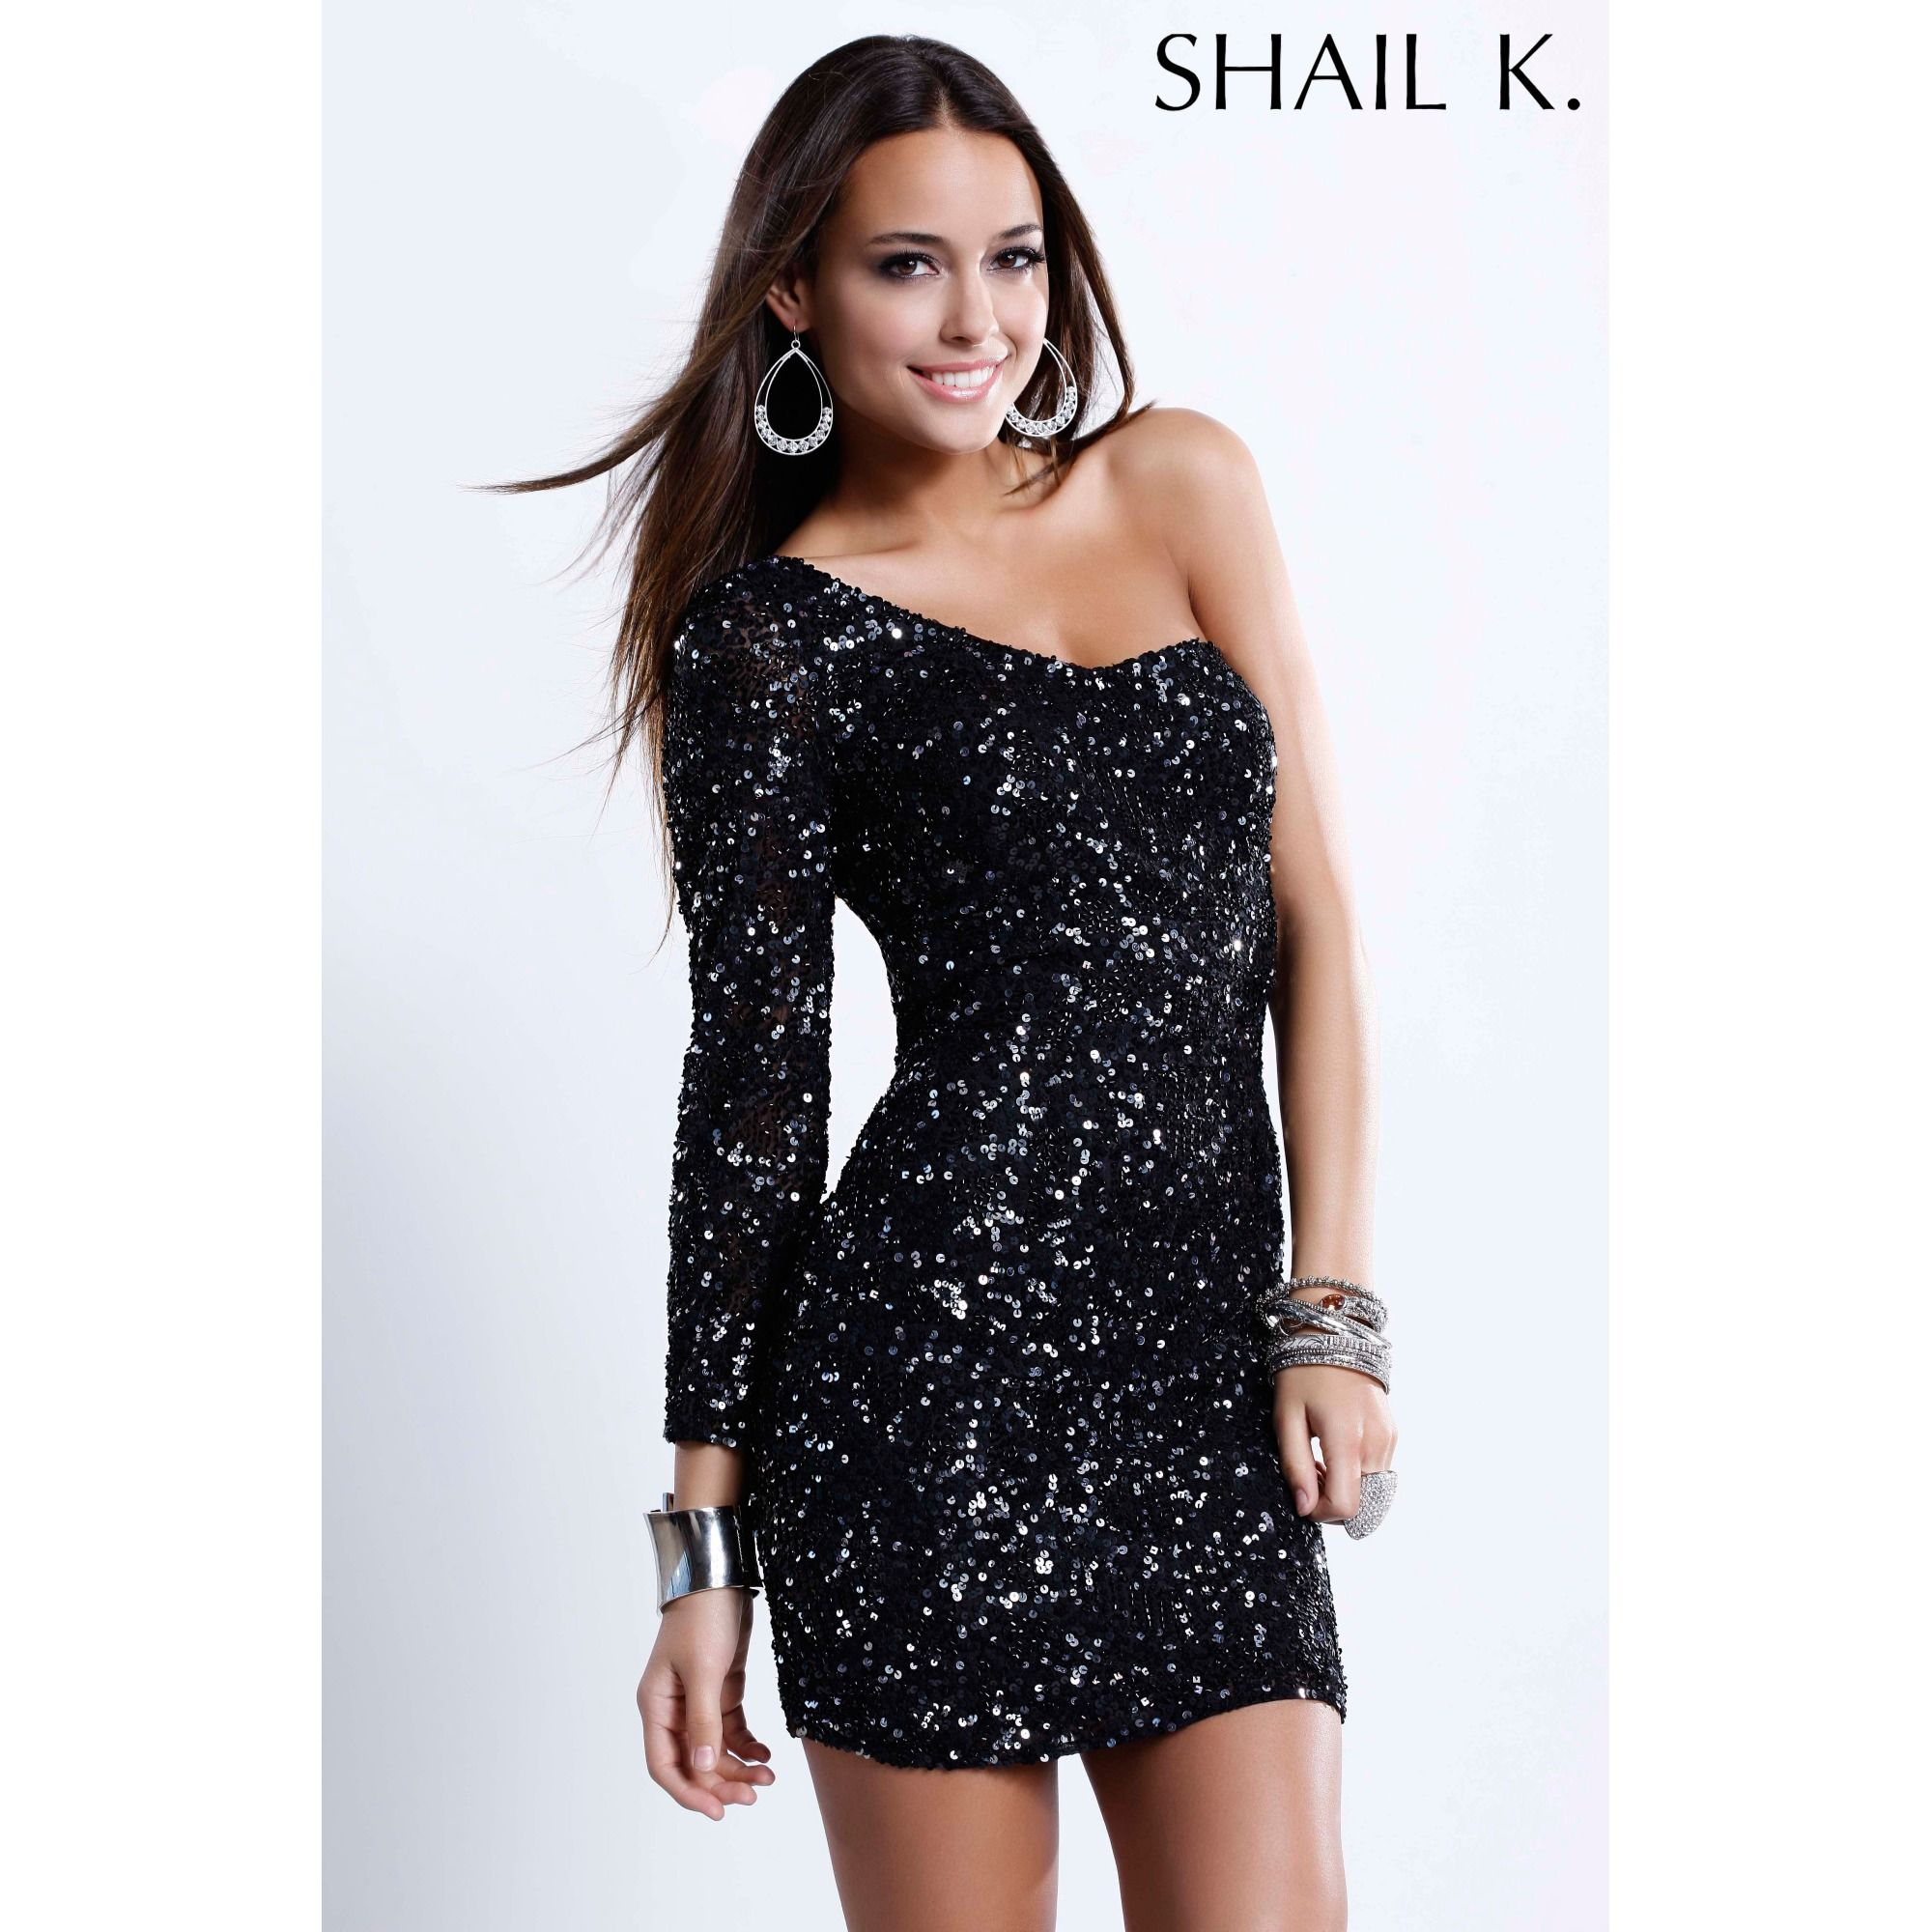 shail kk one sleeve sequin cocktail dress   bridgett   Pinterest ...